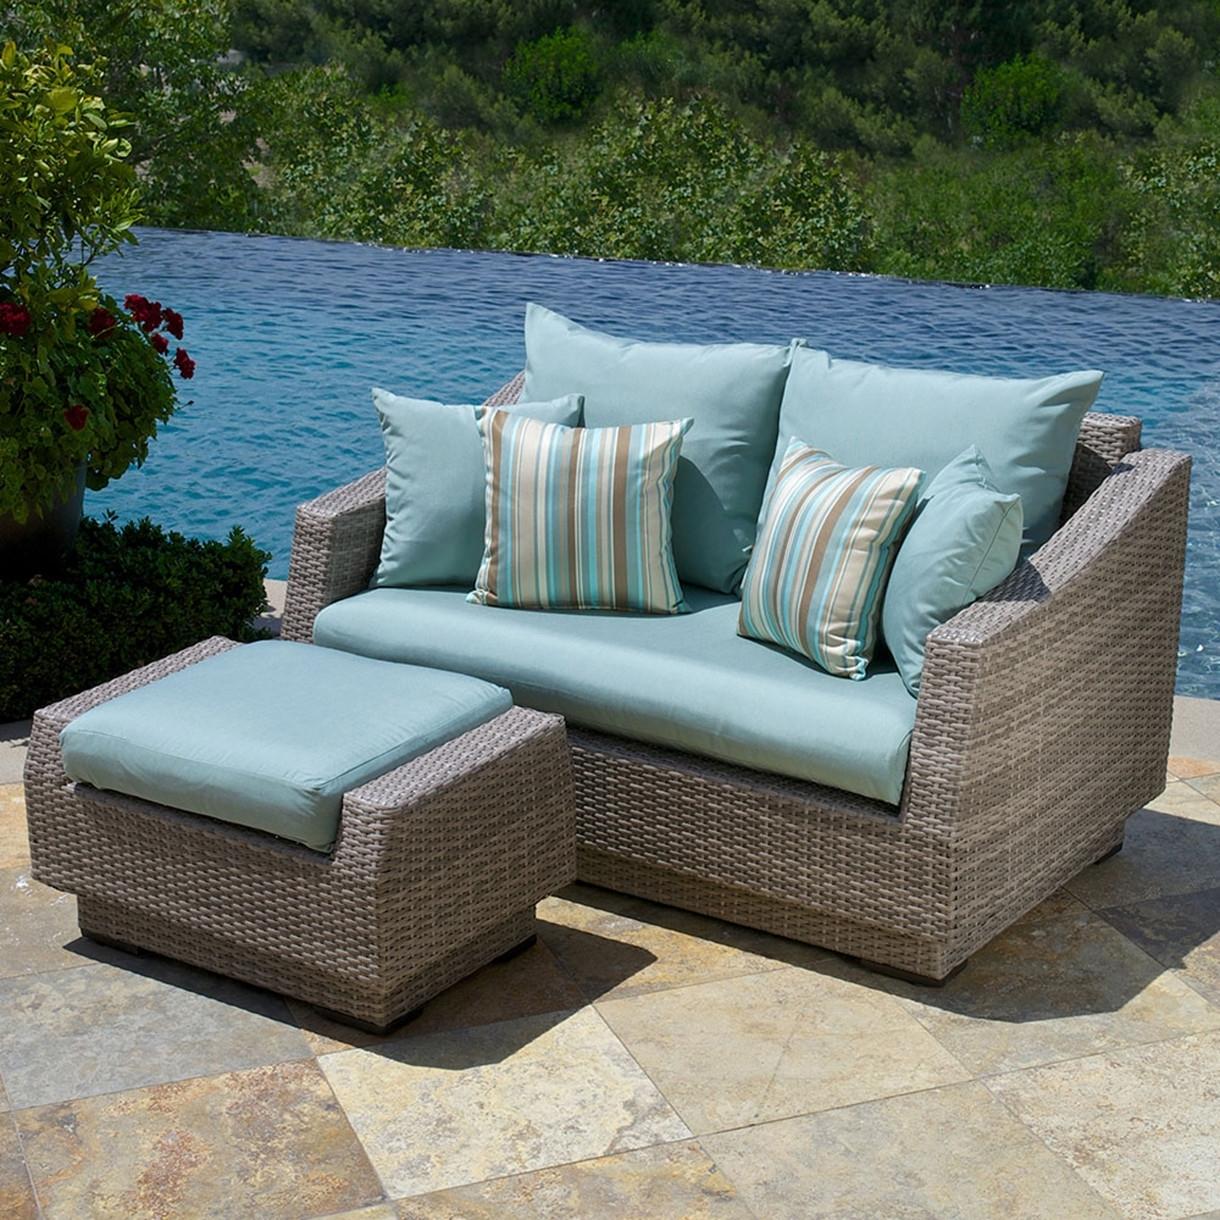 Cuscini per sedie da giardino sedie per giardino - Cuscini per lettini da giardino ...